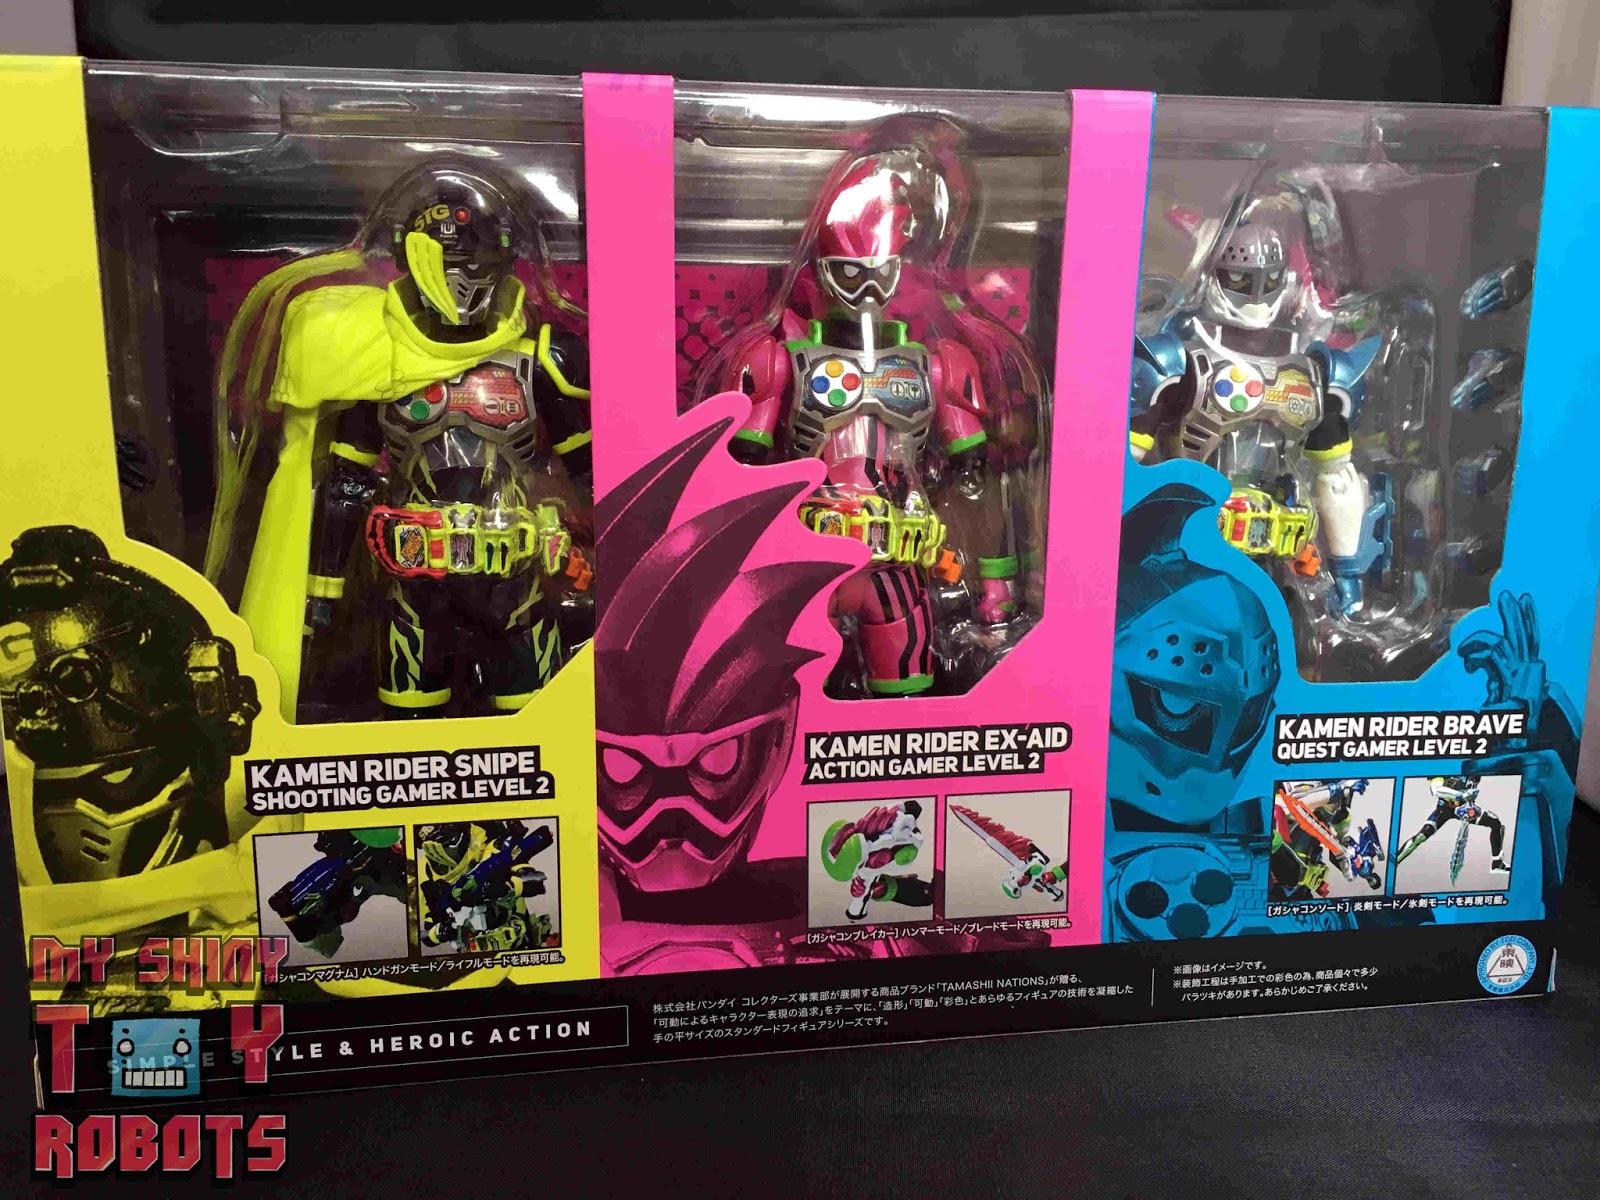 My Shiny Toy Robots: Movie REVIEW: Kamen Rider Ex-Aid